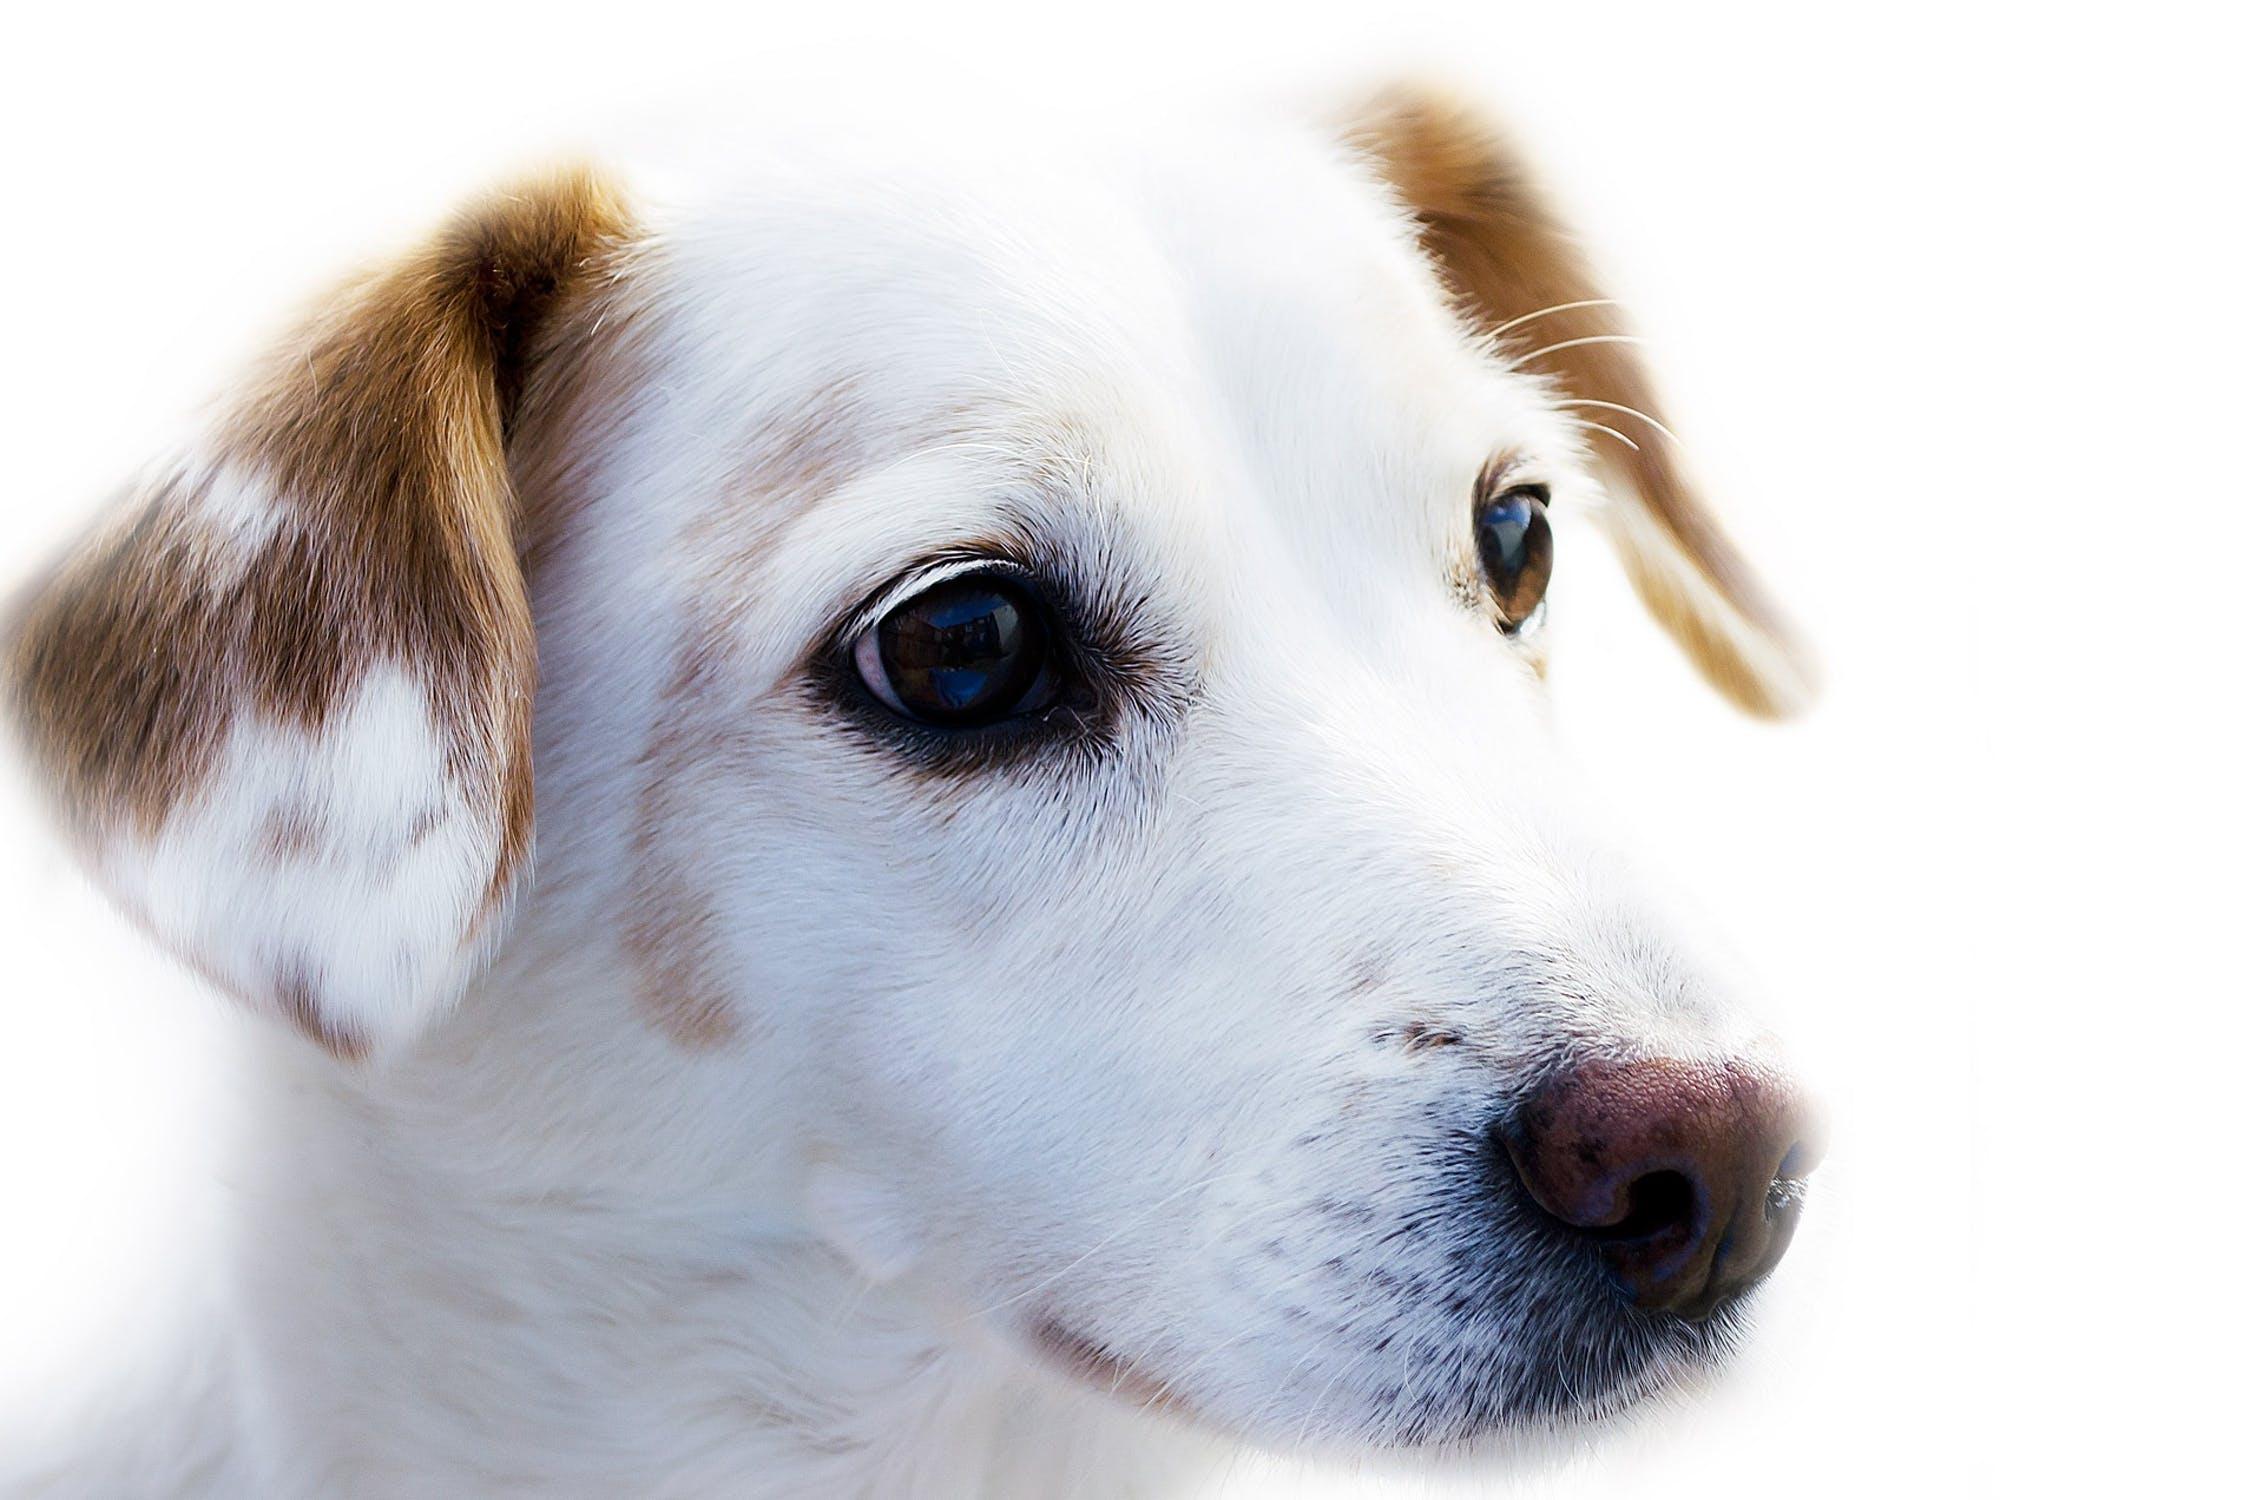 dog animal friend loyalty 67304 - National Dog Day 2018